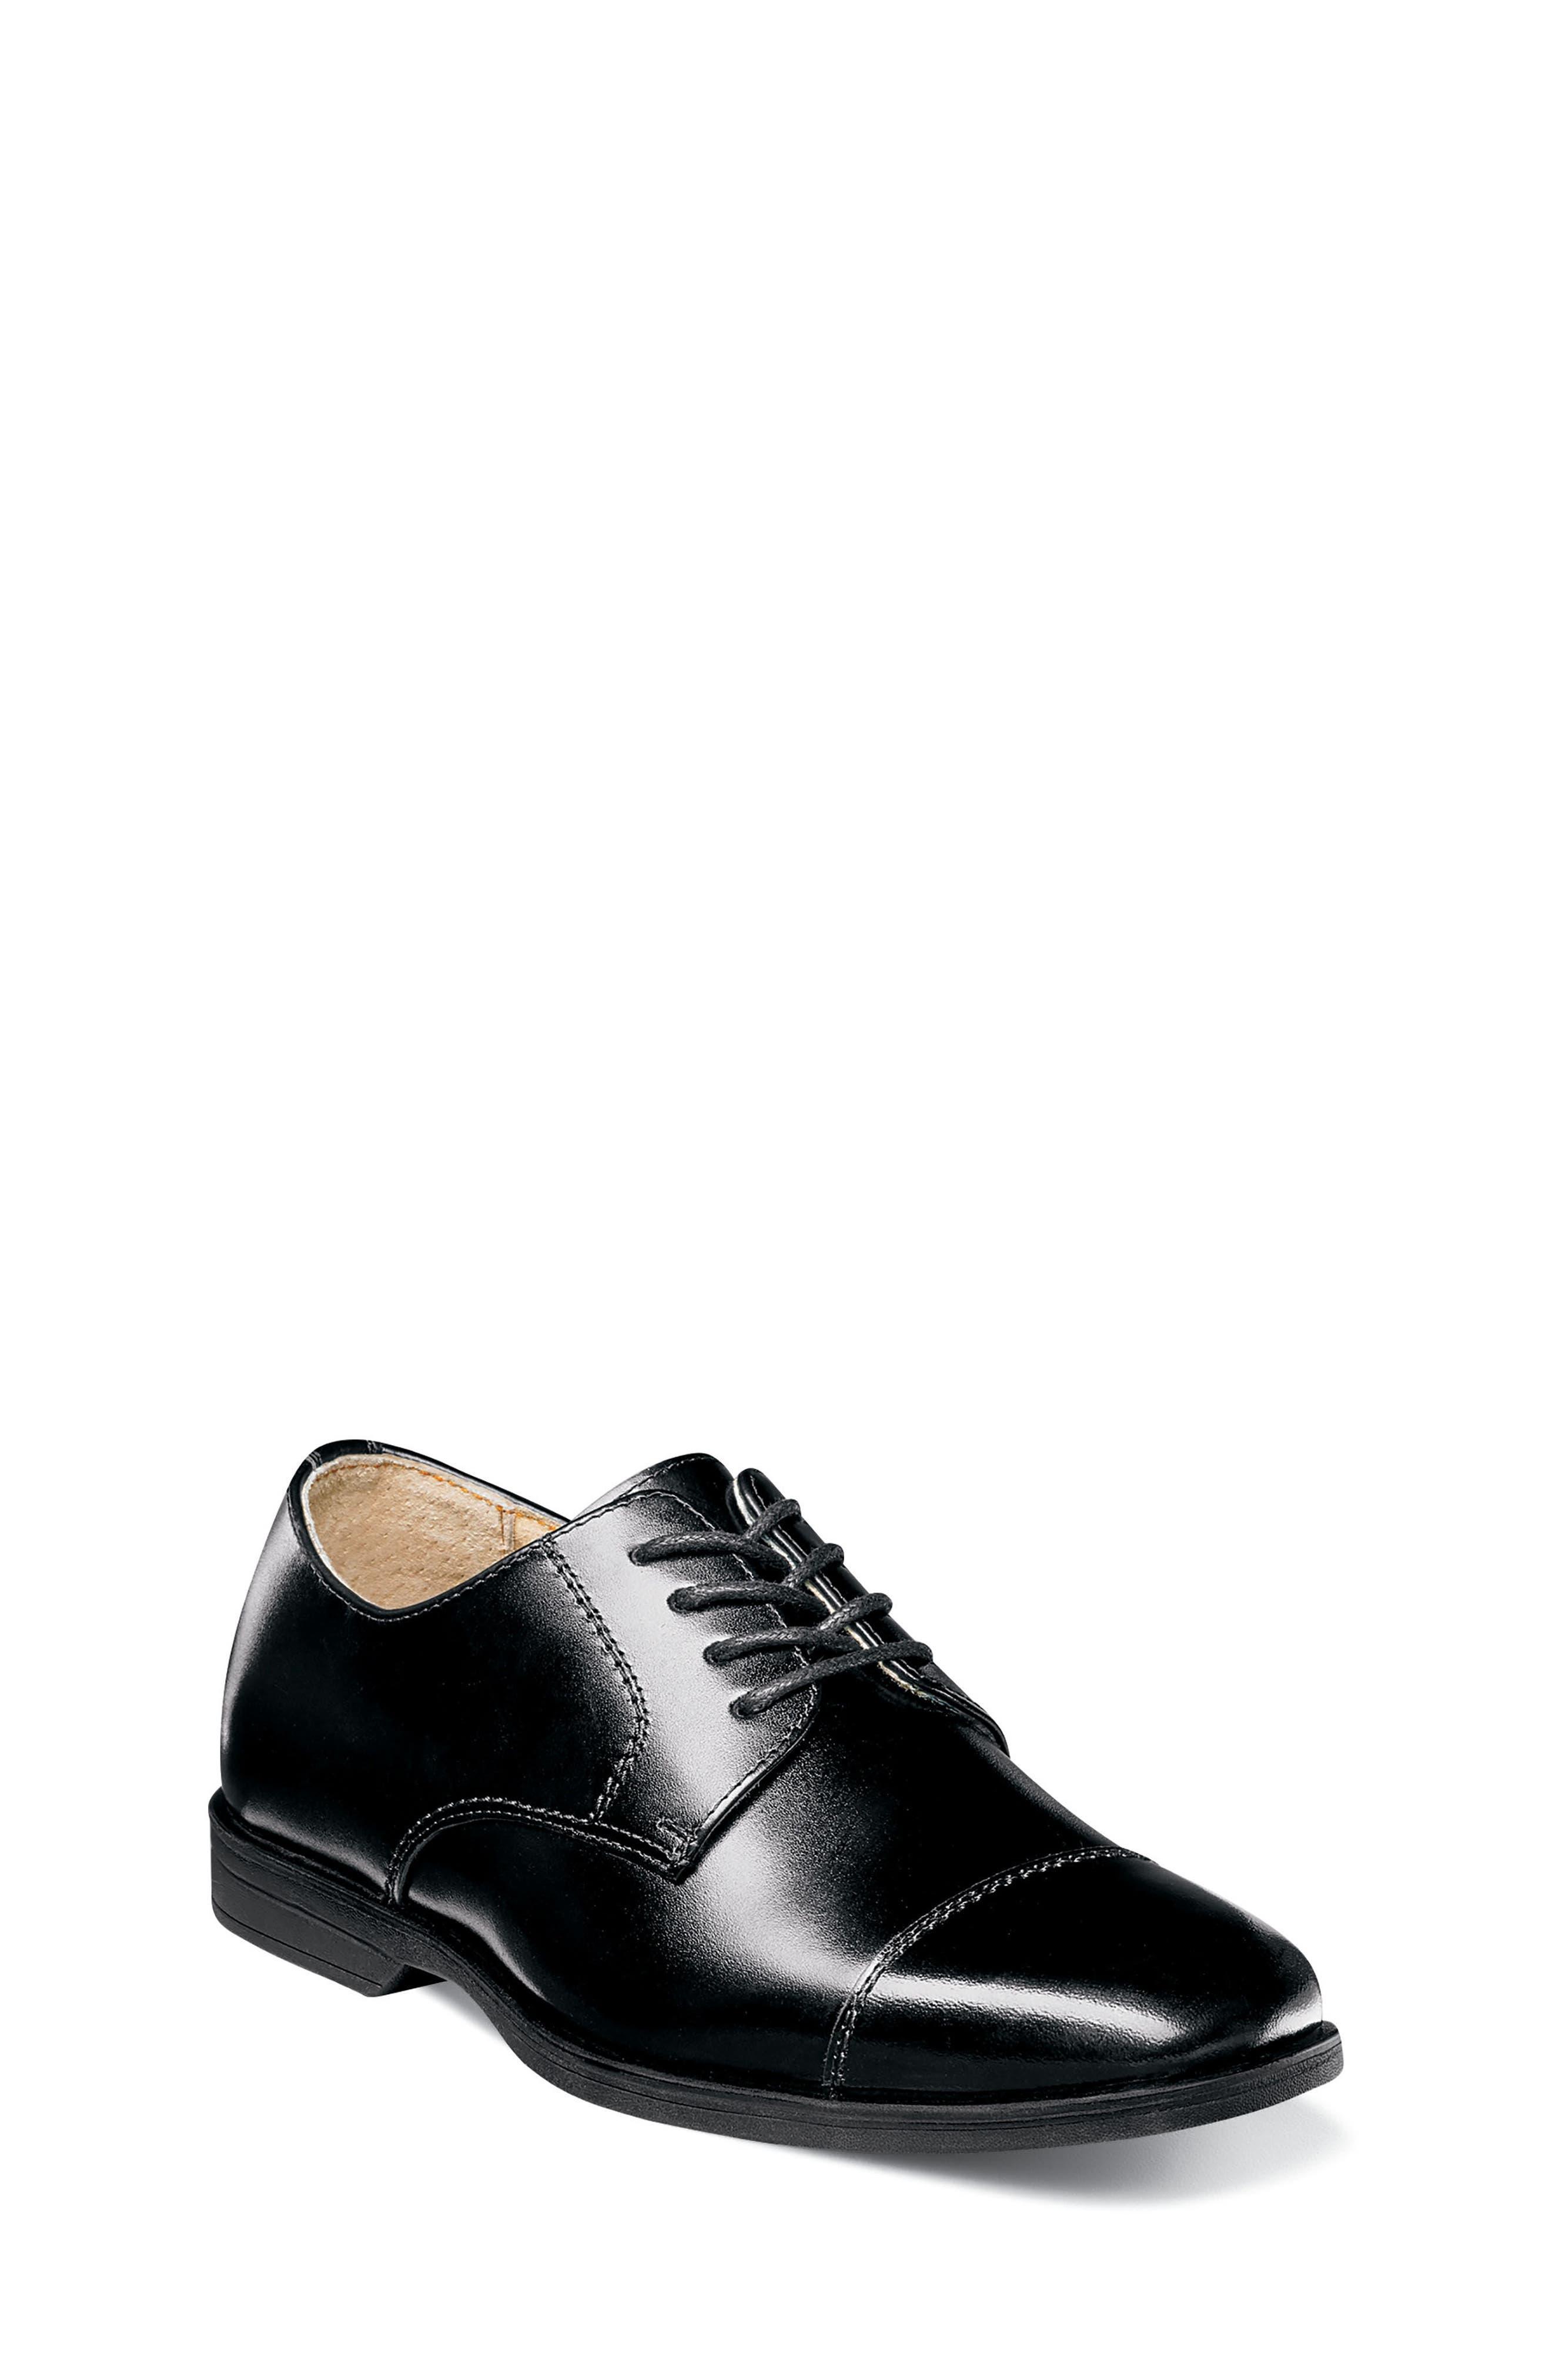 Black dress shoes size 7 night